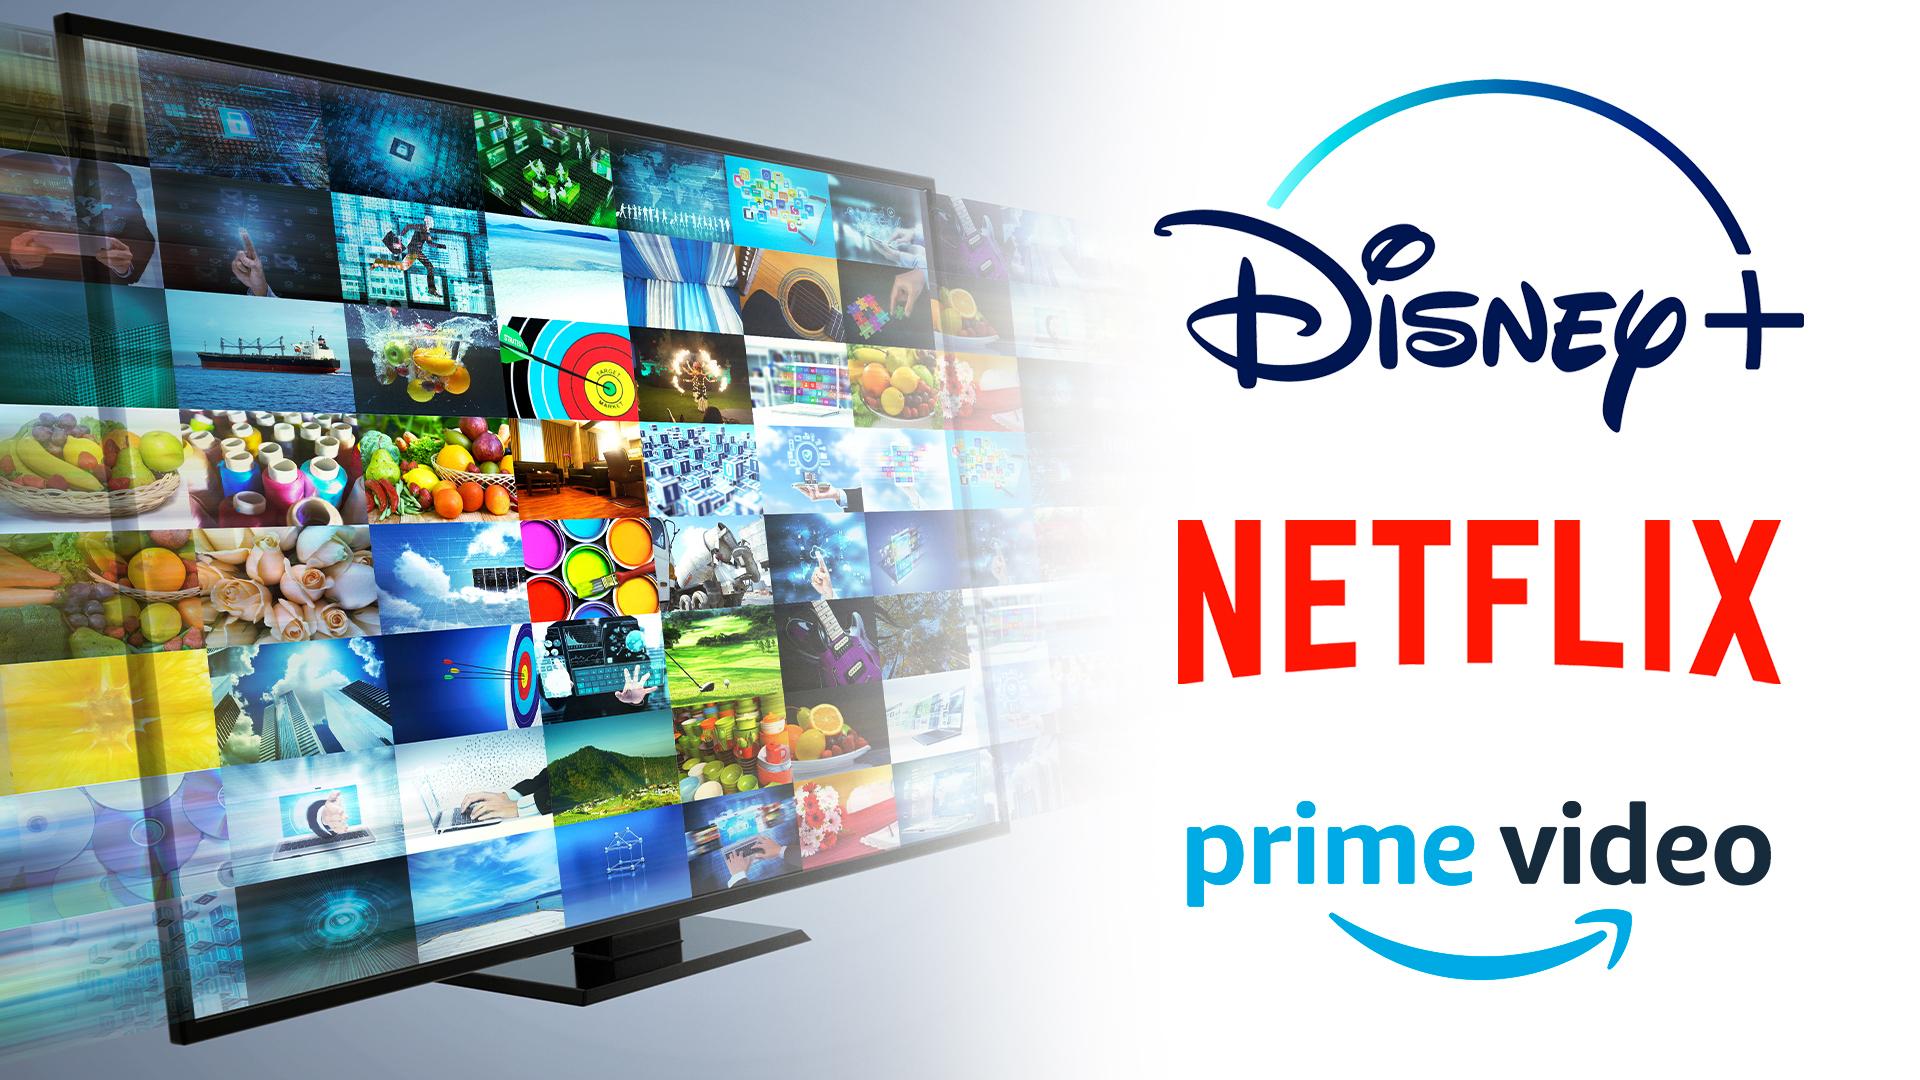 Streaming, Logo, Netflix, Videoplattform, Streamingportal, Disney+, Videostreaming, Amazon Prime Video, Prime Video, Disney Plus, Netflix Logo